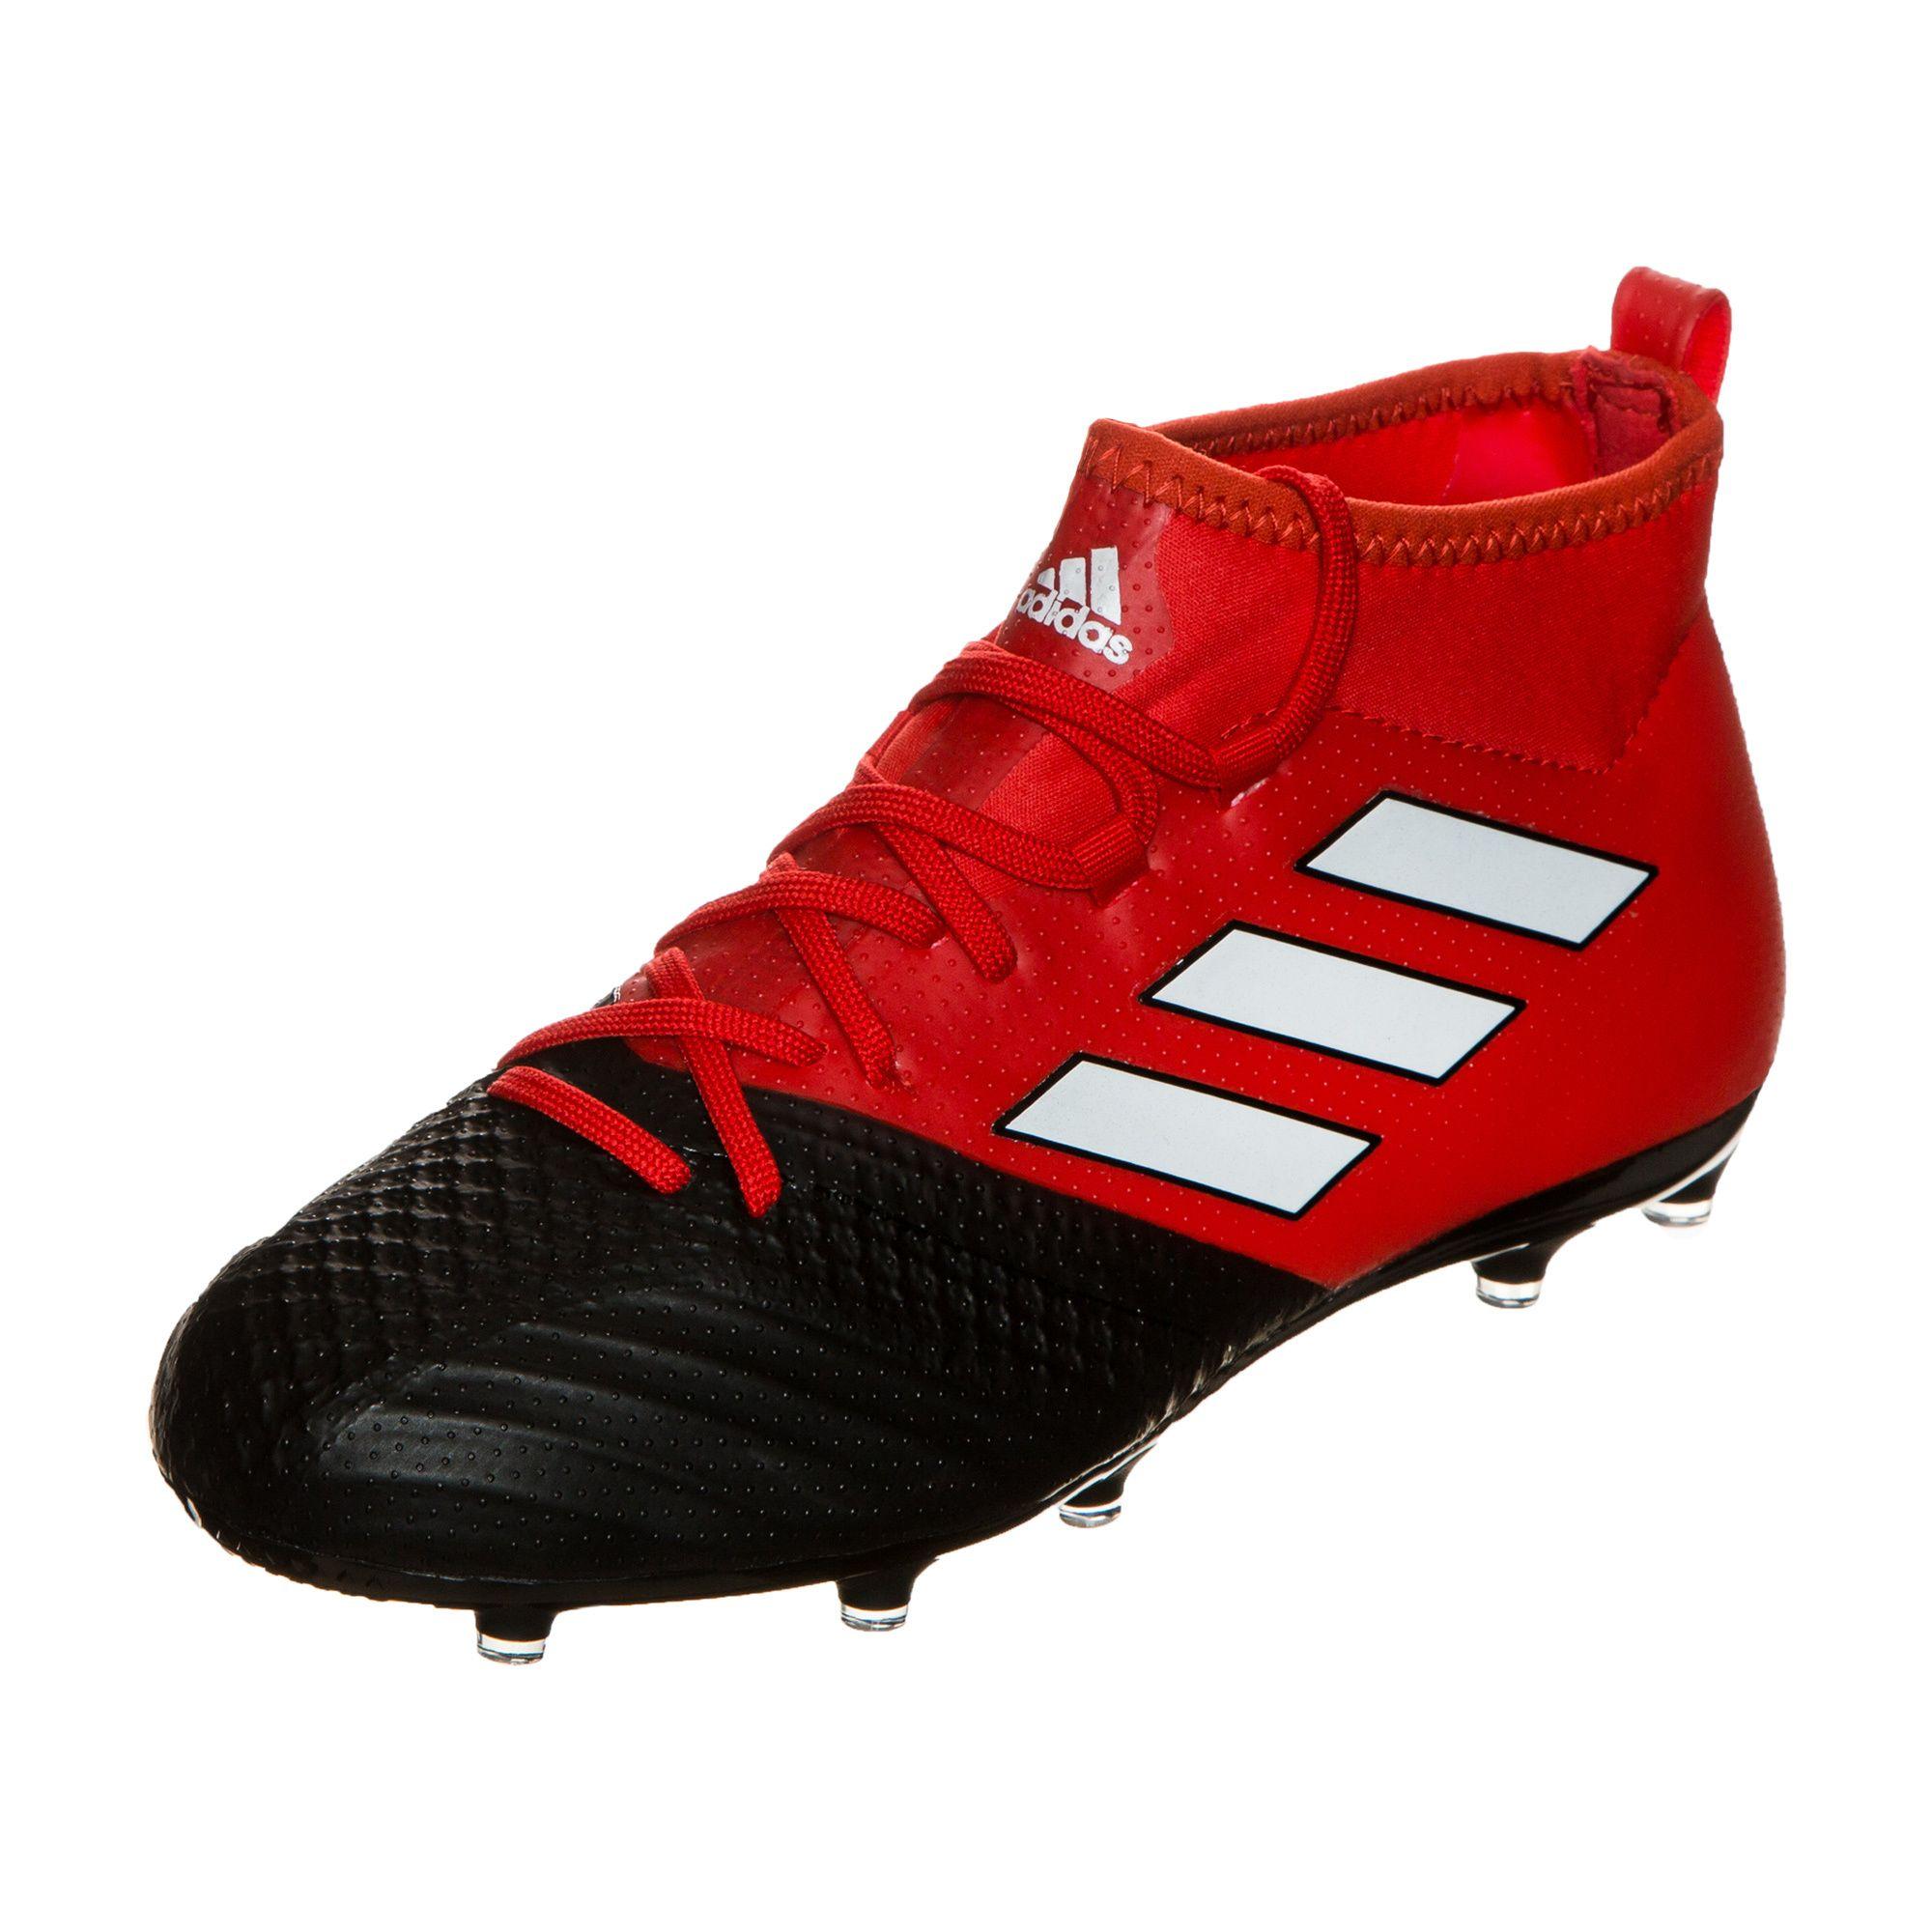 ADIDAS PERFORMANCE adidas Performance ACE 17.1 Primeknit FG Fußballschuh Kinder